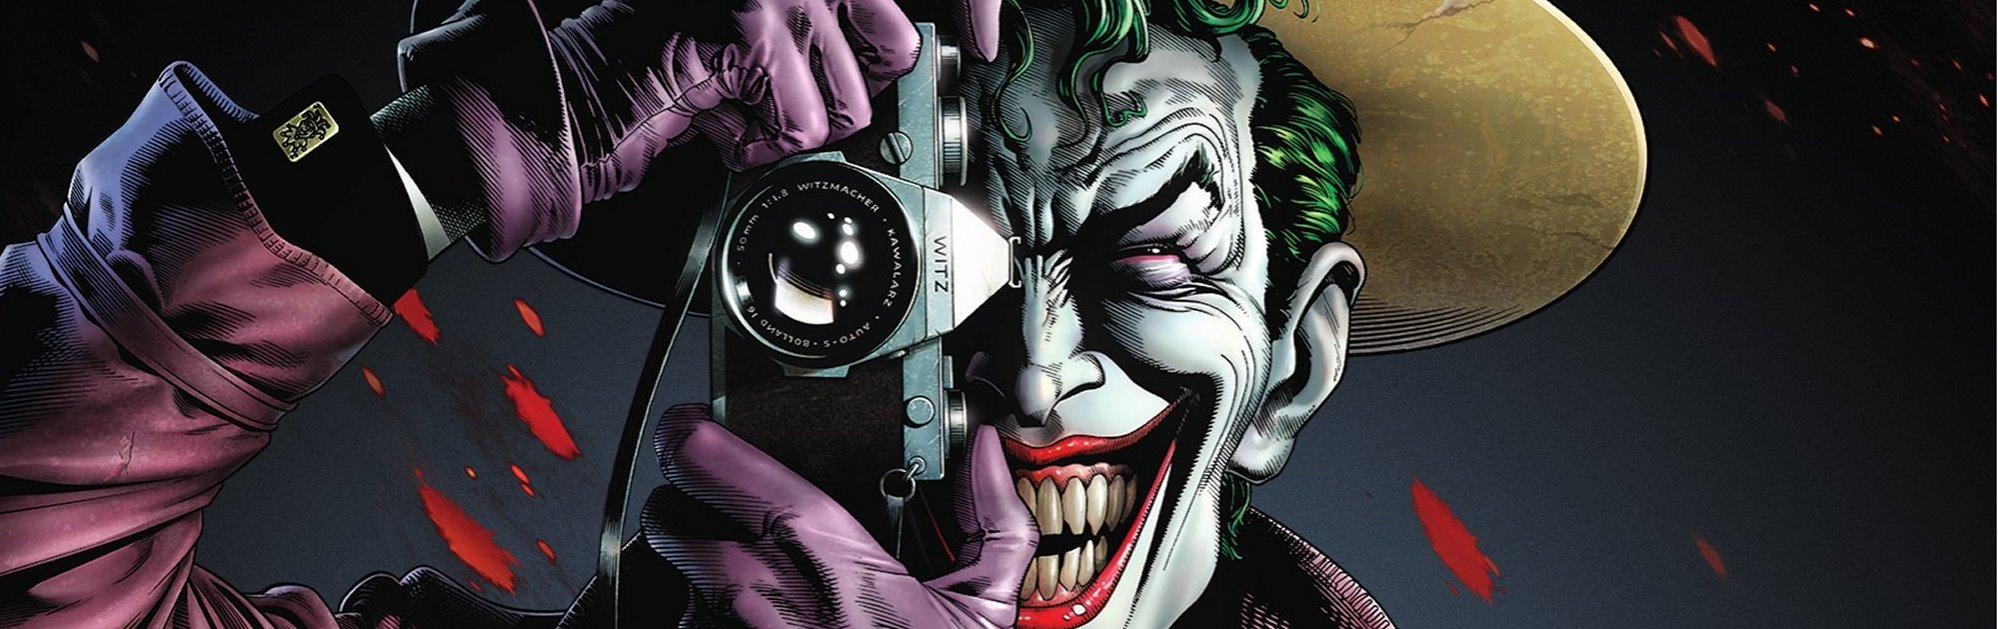 Killing Joke DC Animated